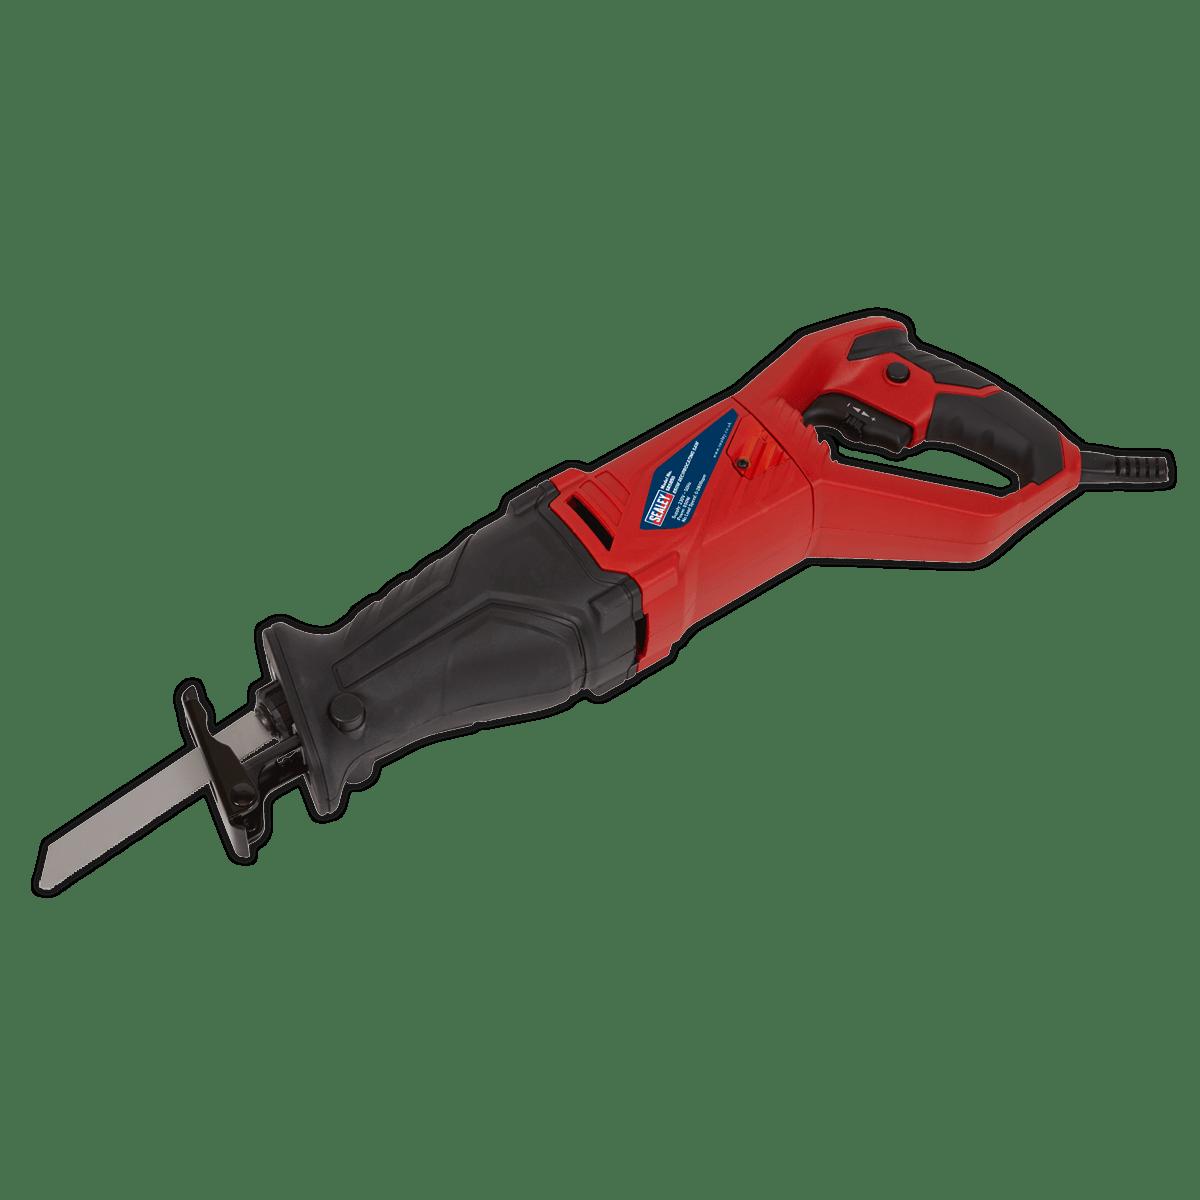 Sealey Reciprocating Saw 850W/230V SRS850